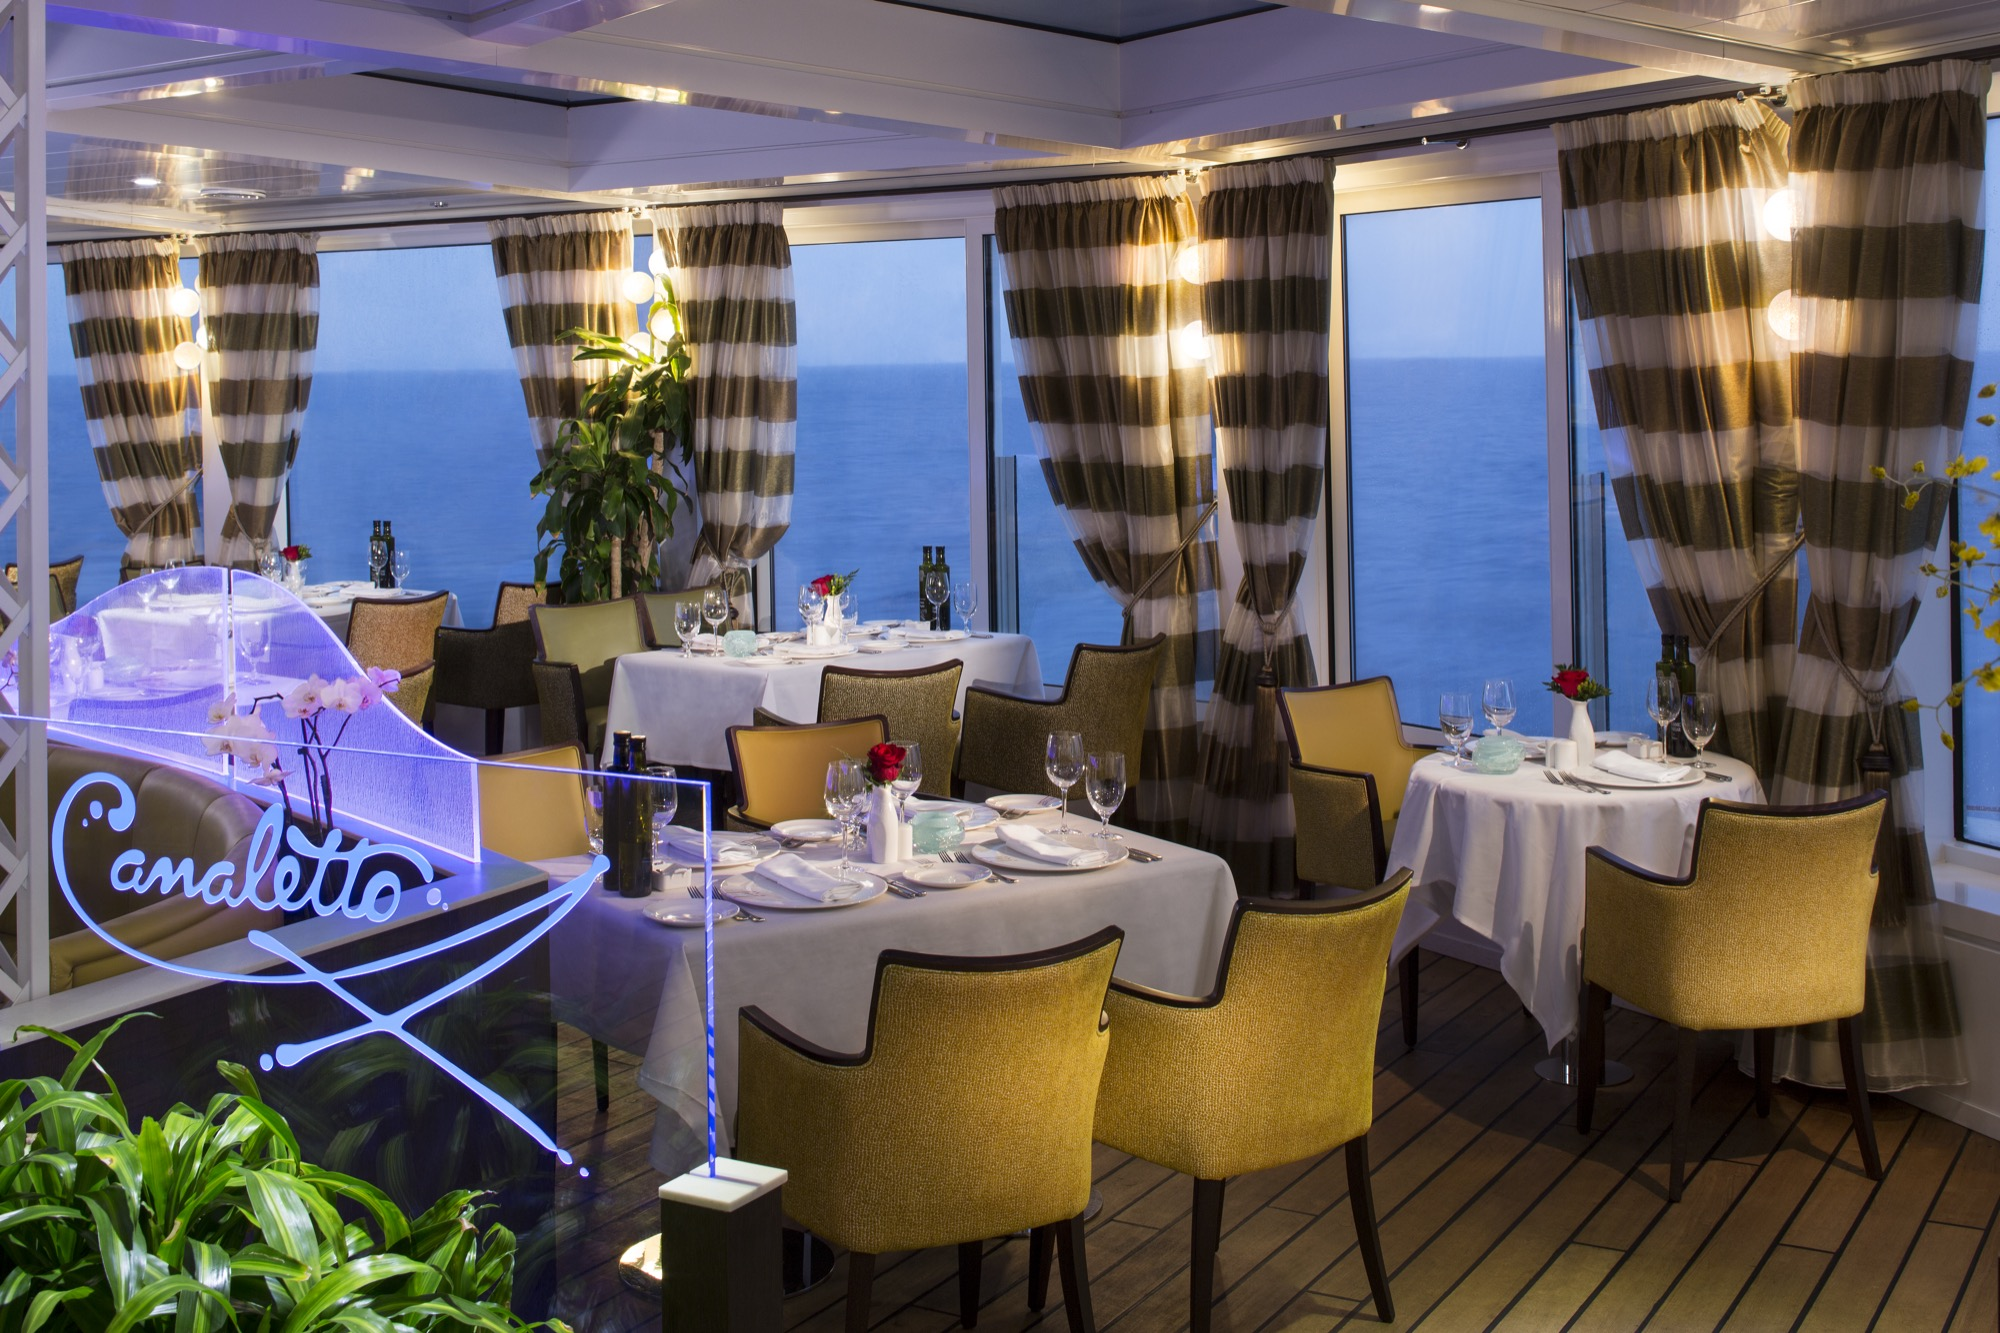 Holland America Line R-Class Canaletto Restaurant.jpg